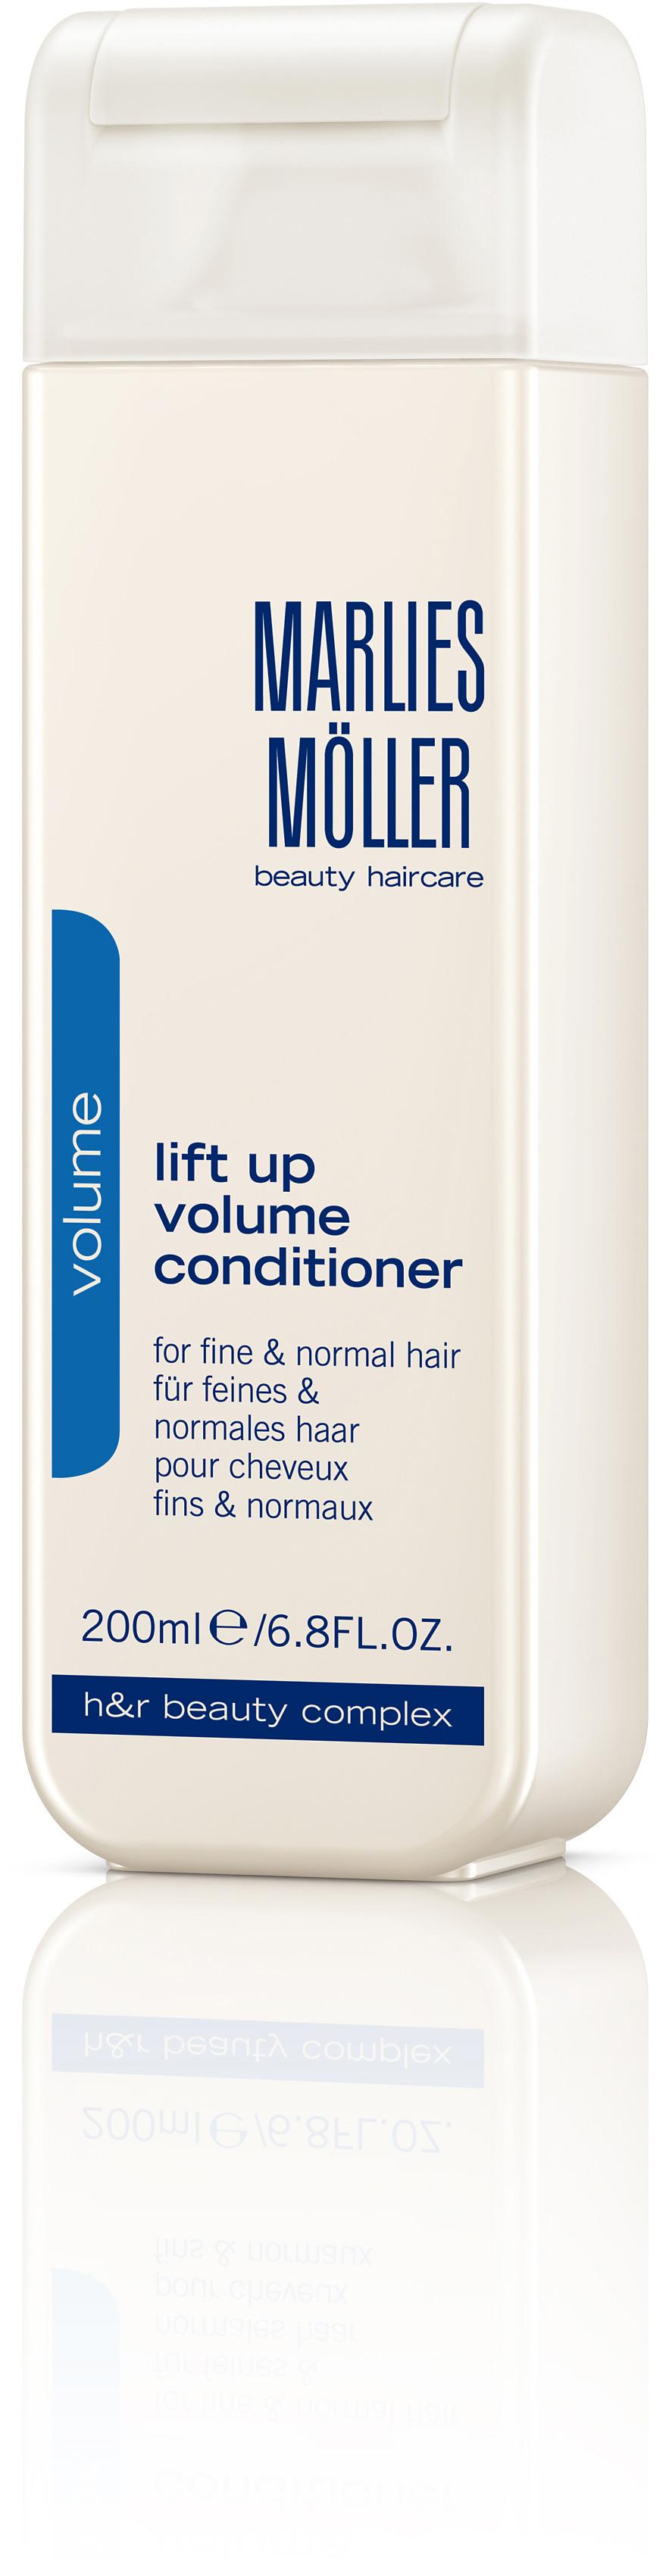 Marlies Möller Care Volume Conditioner 200 ml